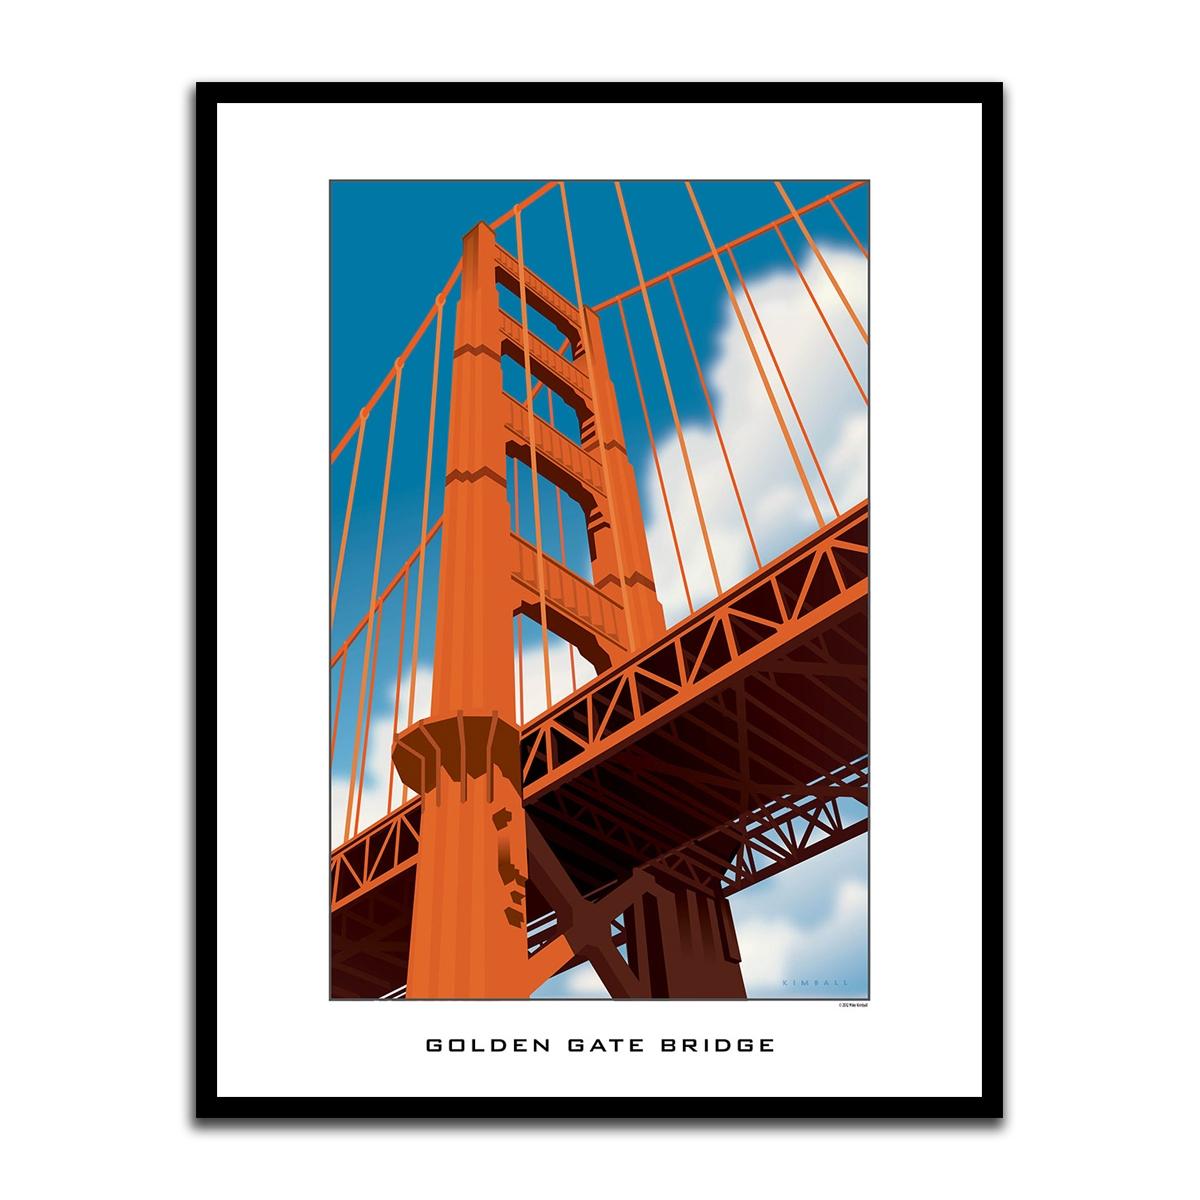 Framed Poster Golden Gate Bridge Graphic Diagram Of The